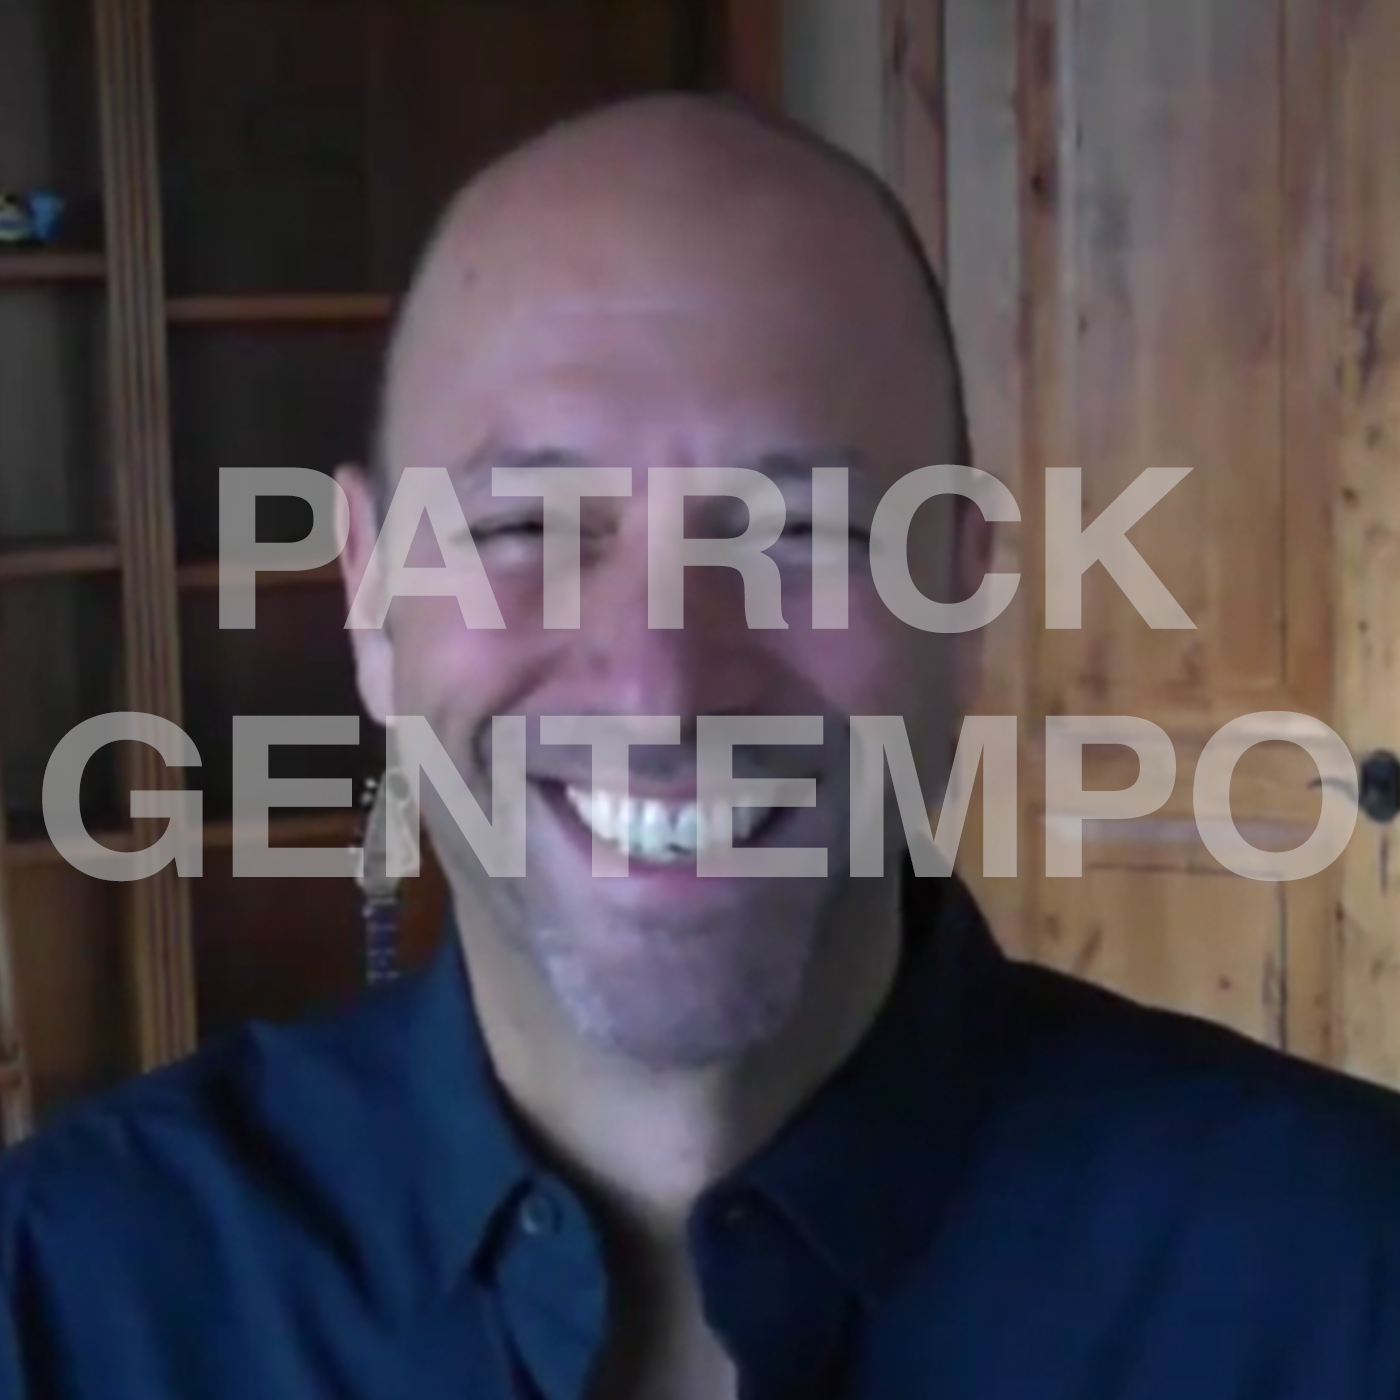 patrick-gentempo.png